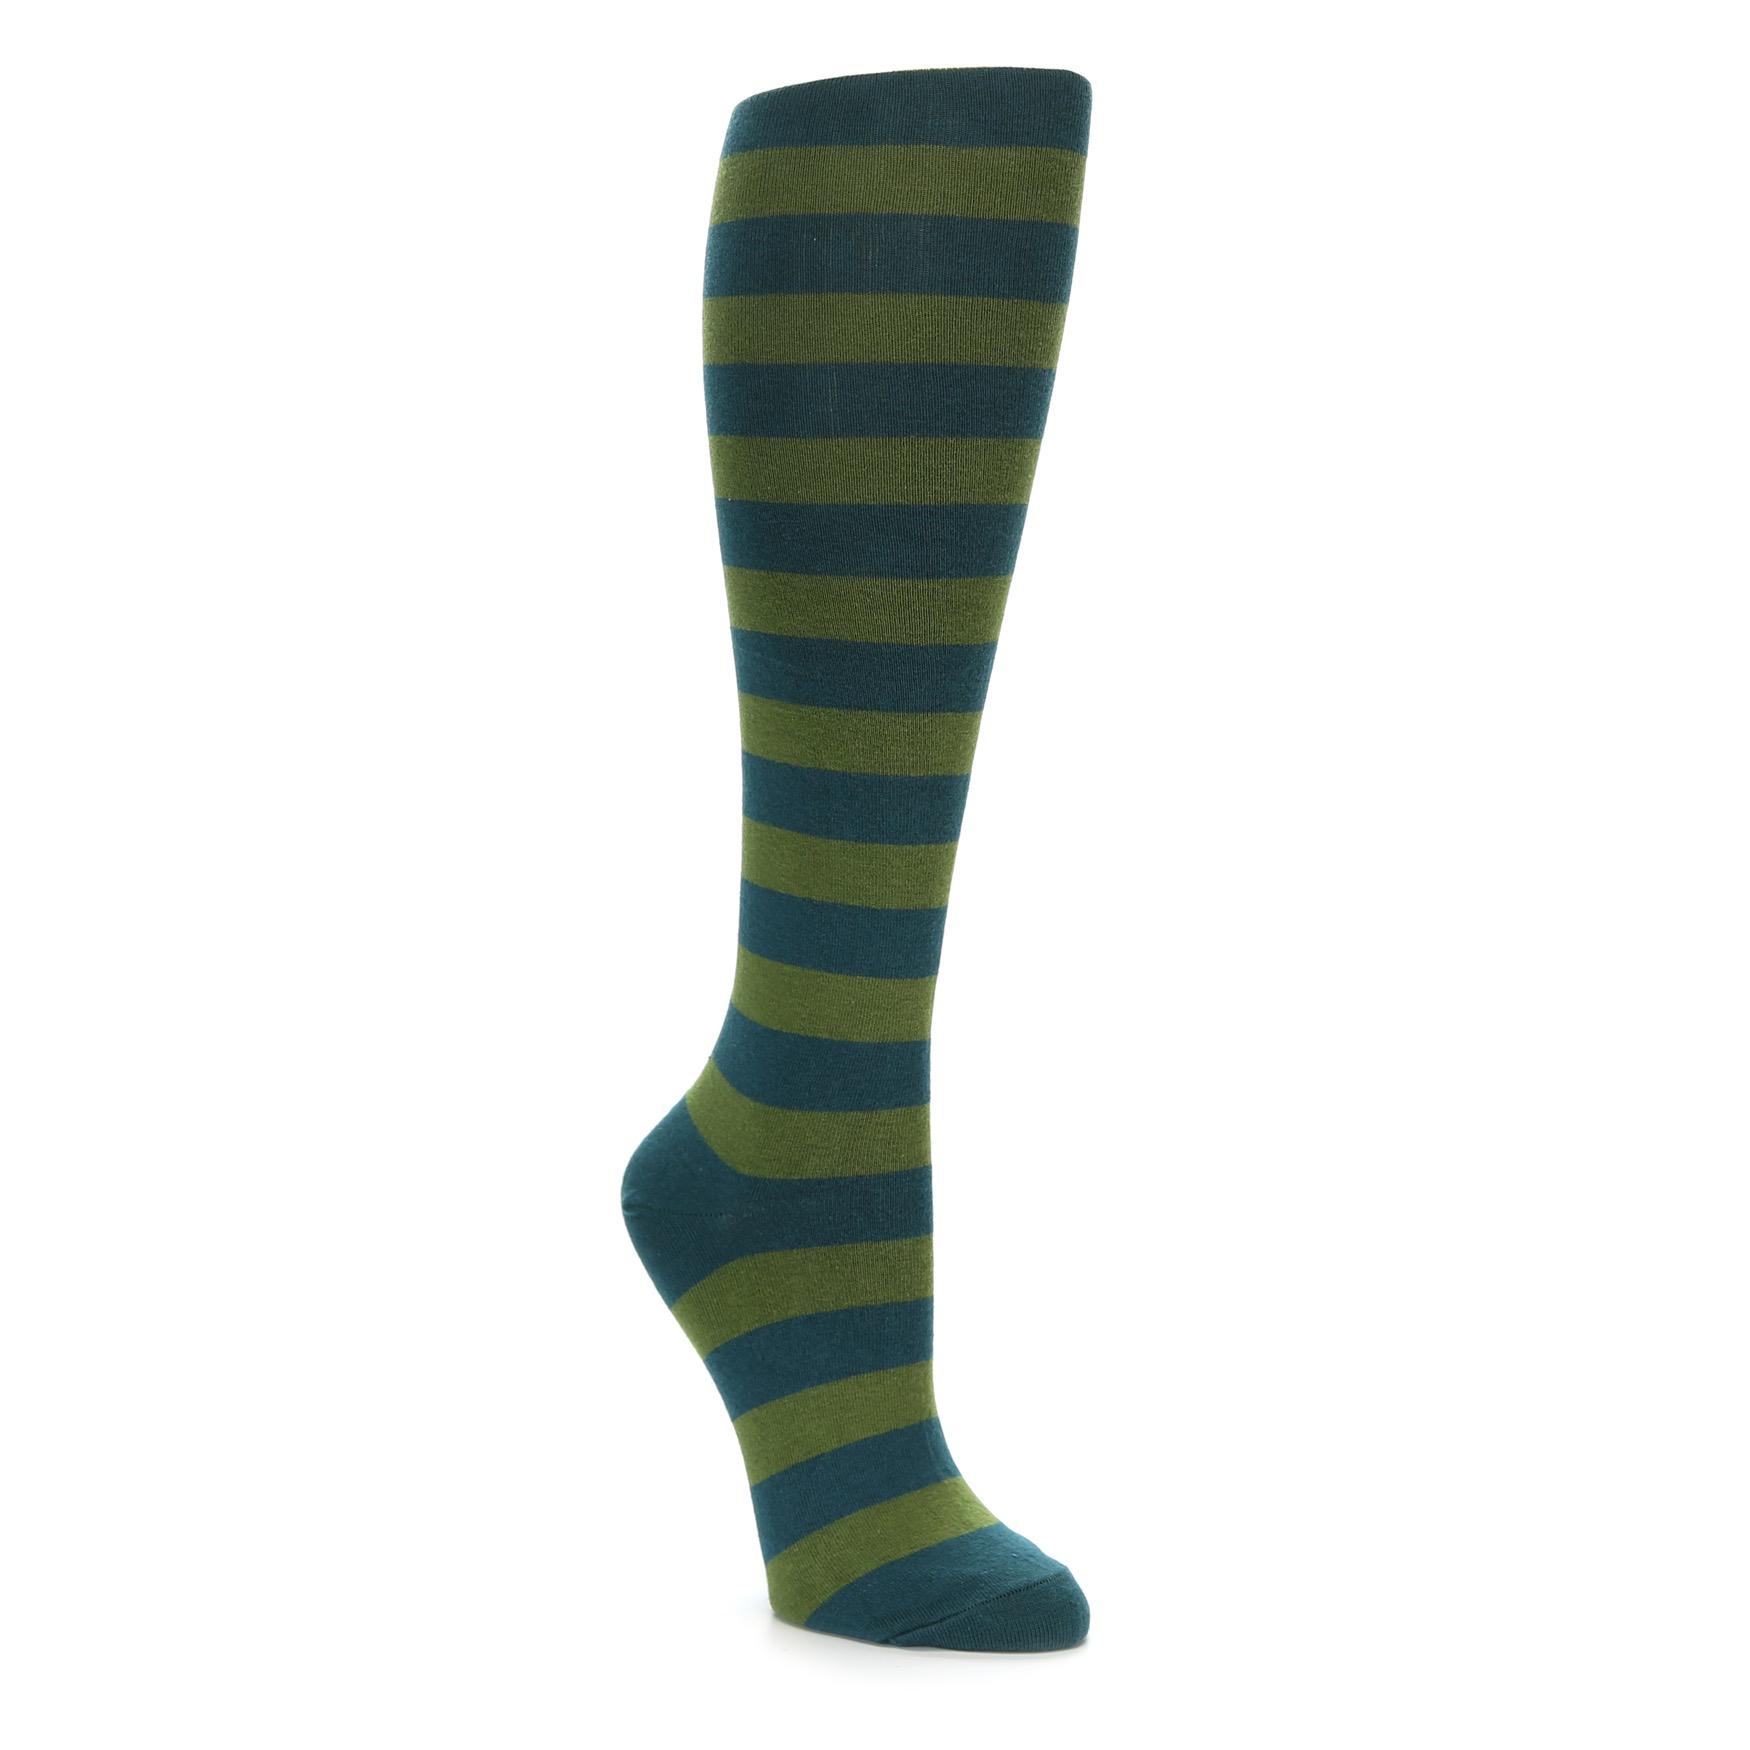 b56c4d7b4 Teal Olive Stripes Women s Knee High Socks